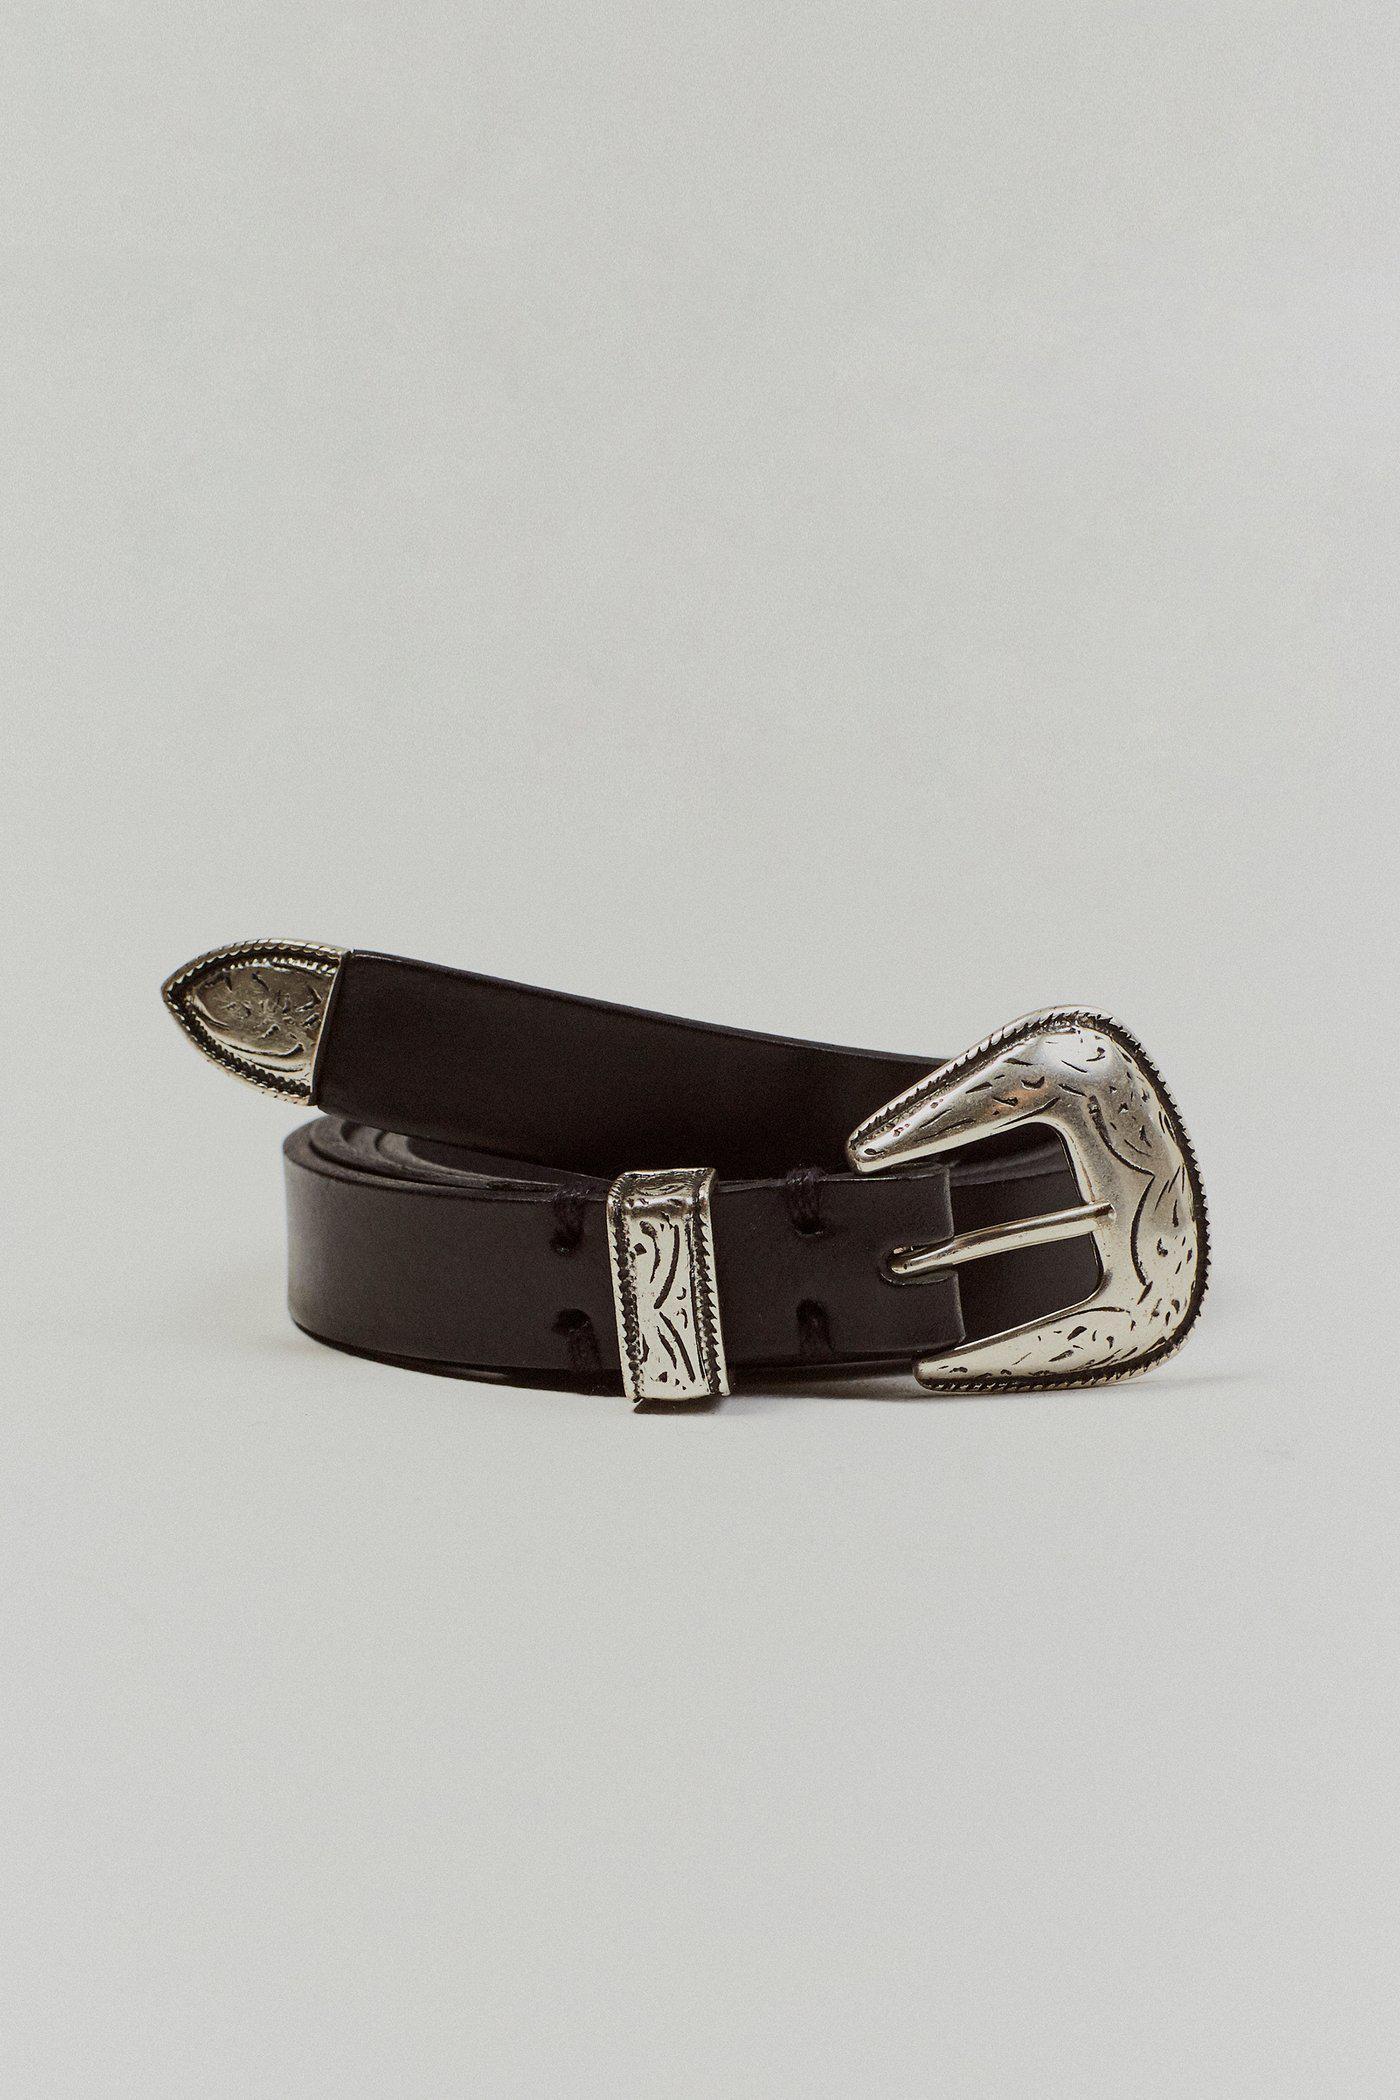 Small Leather Goods - Belts Masscob pL55GWVi